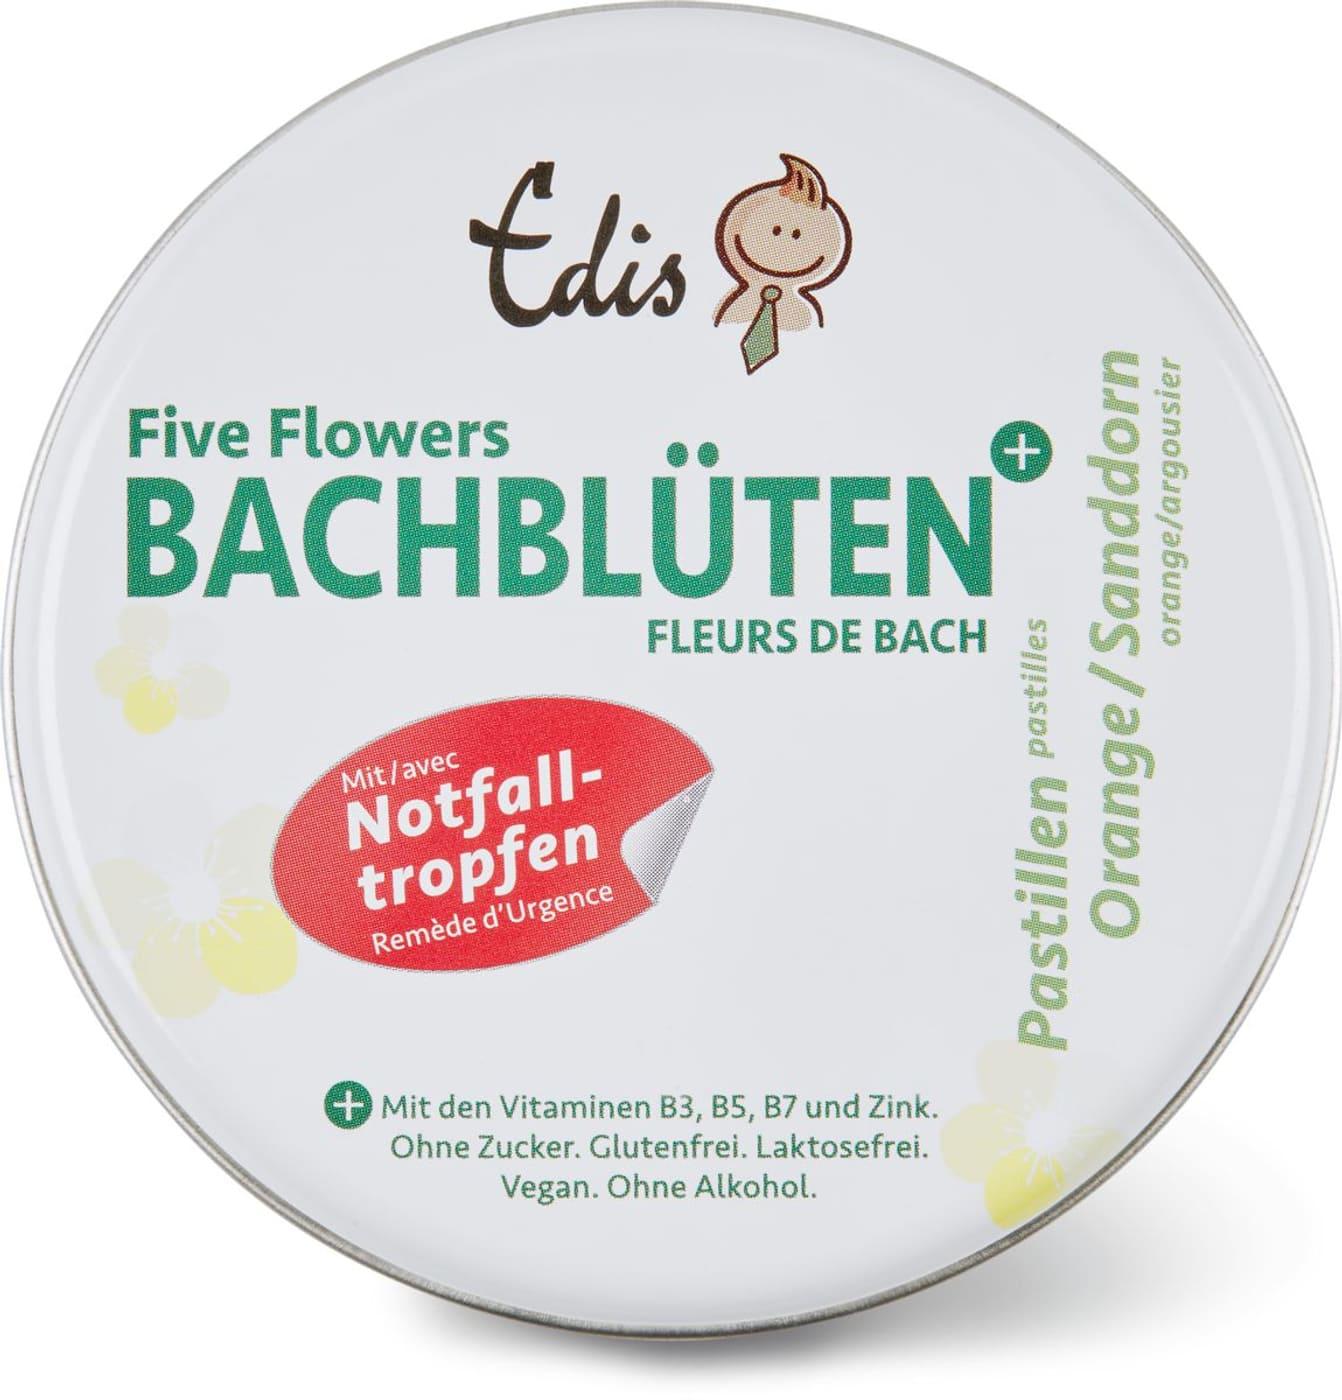 Edis Fleur De Bach Pastille Migros